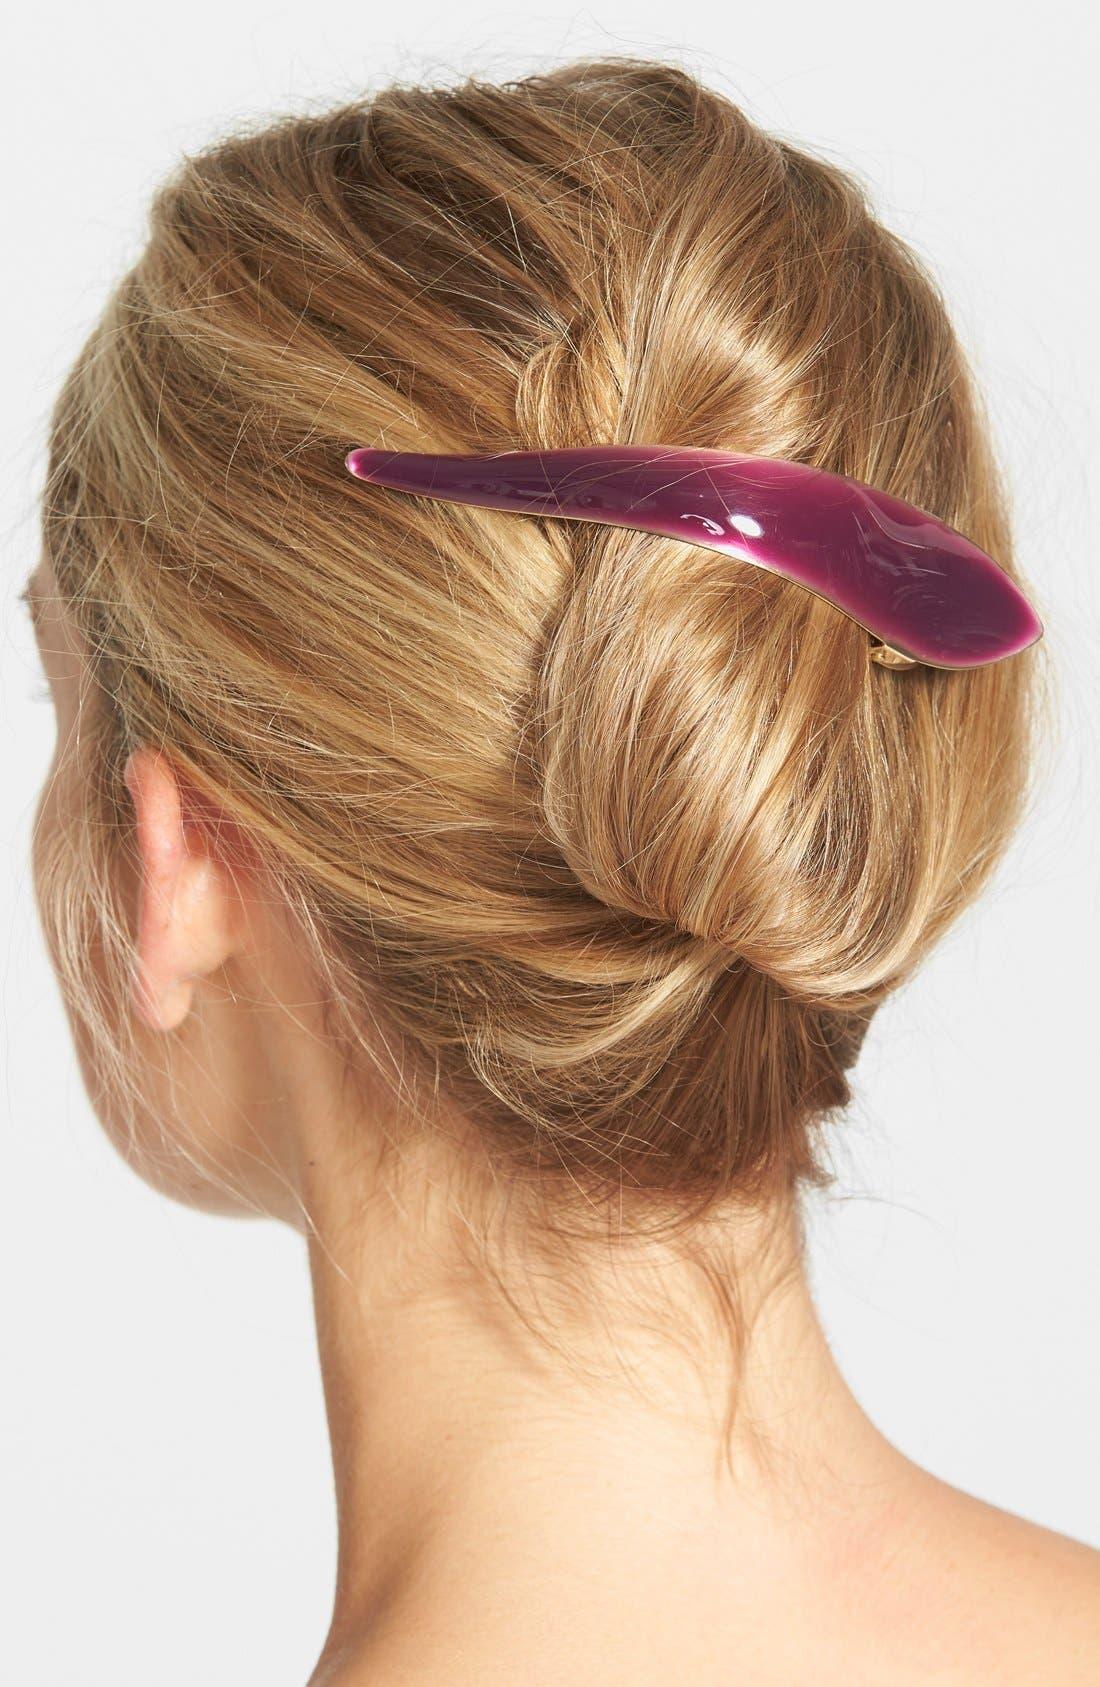 Main Image - Ficcare Maximas Silky Hair Clip